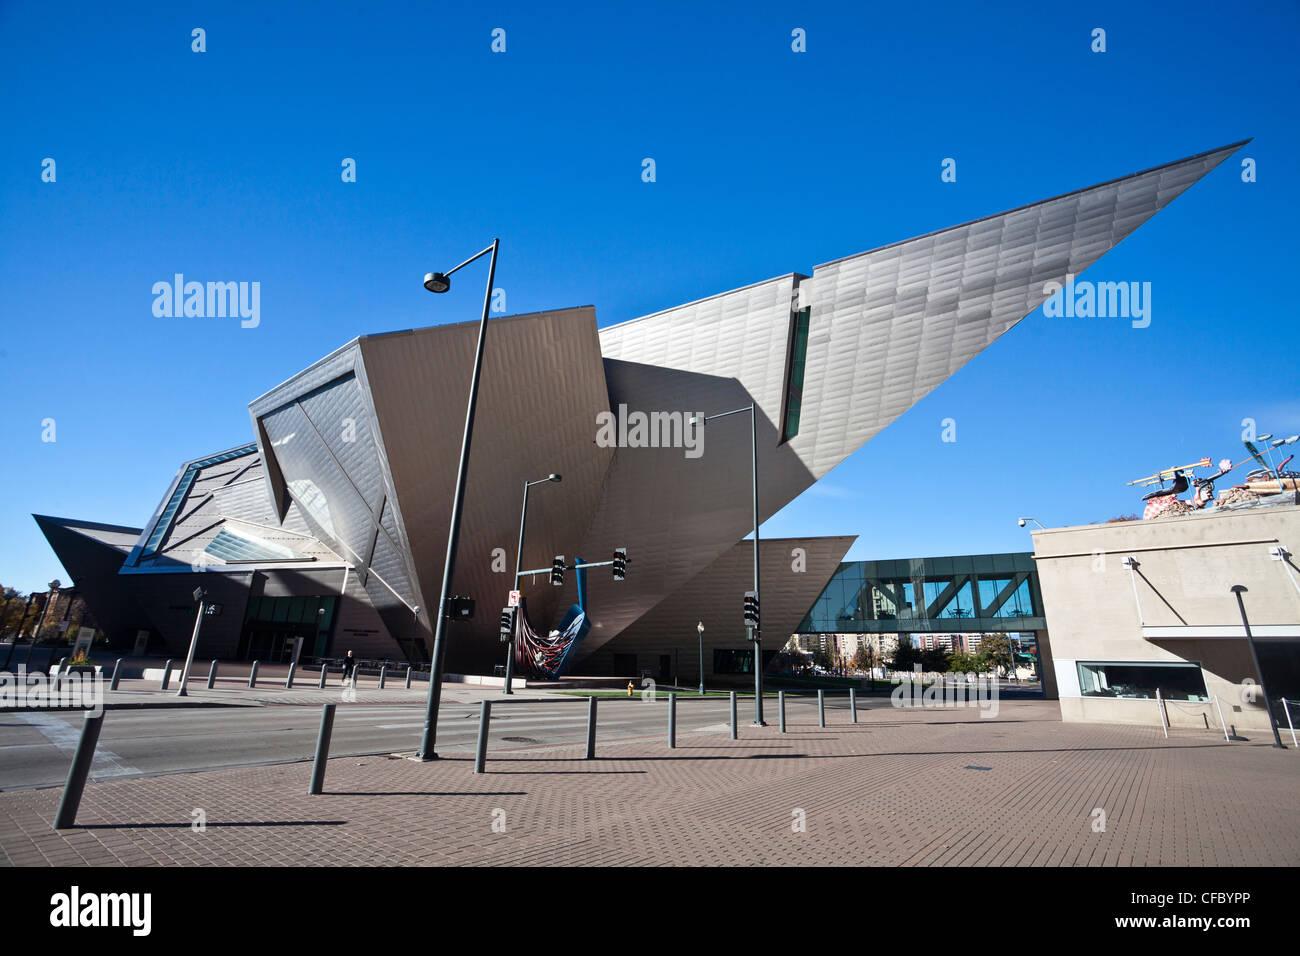 USA, United States, America, Colorado, Denver, City, Art Museum, building, Frederic Hamilton, architecture, art, - Stock Image